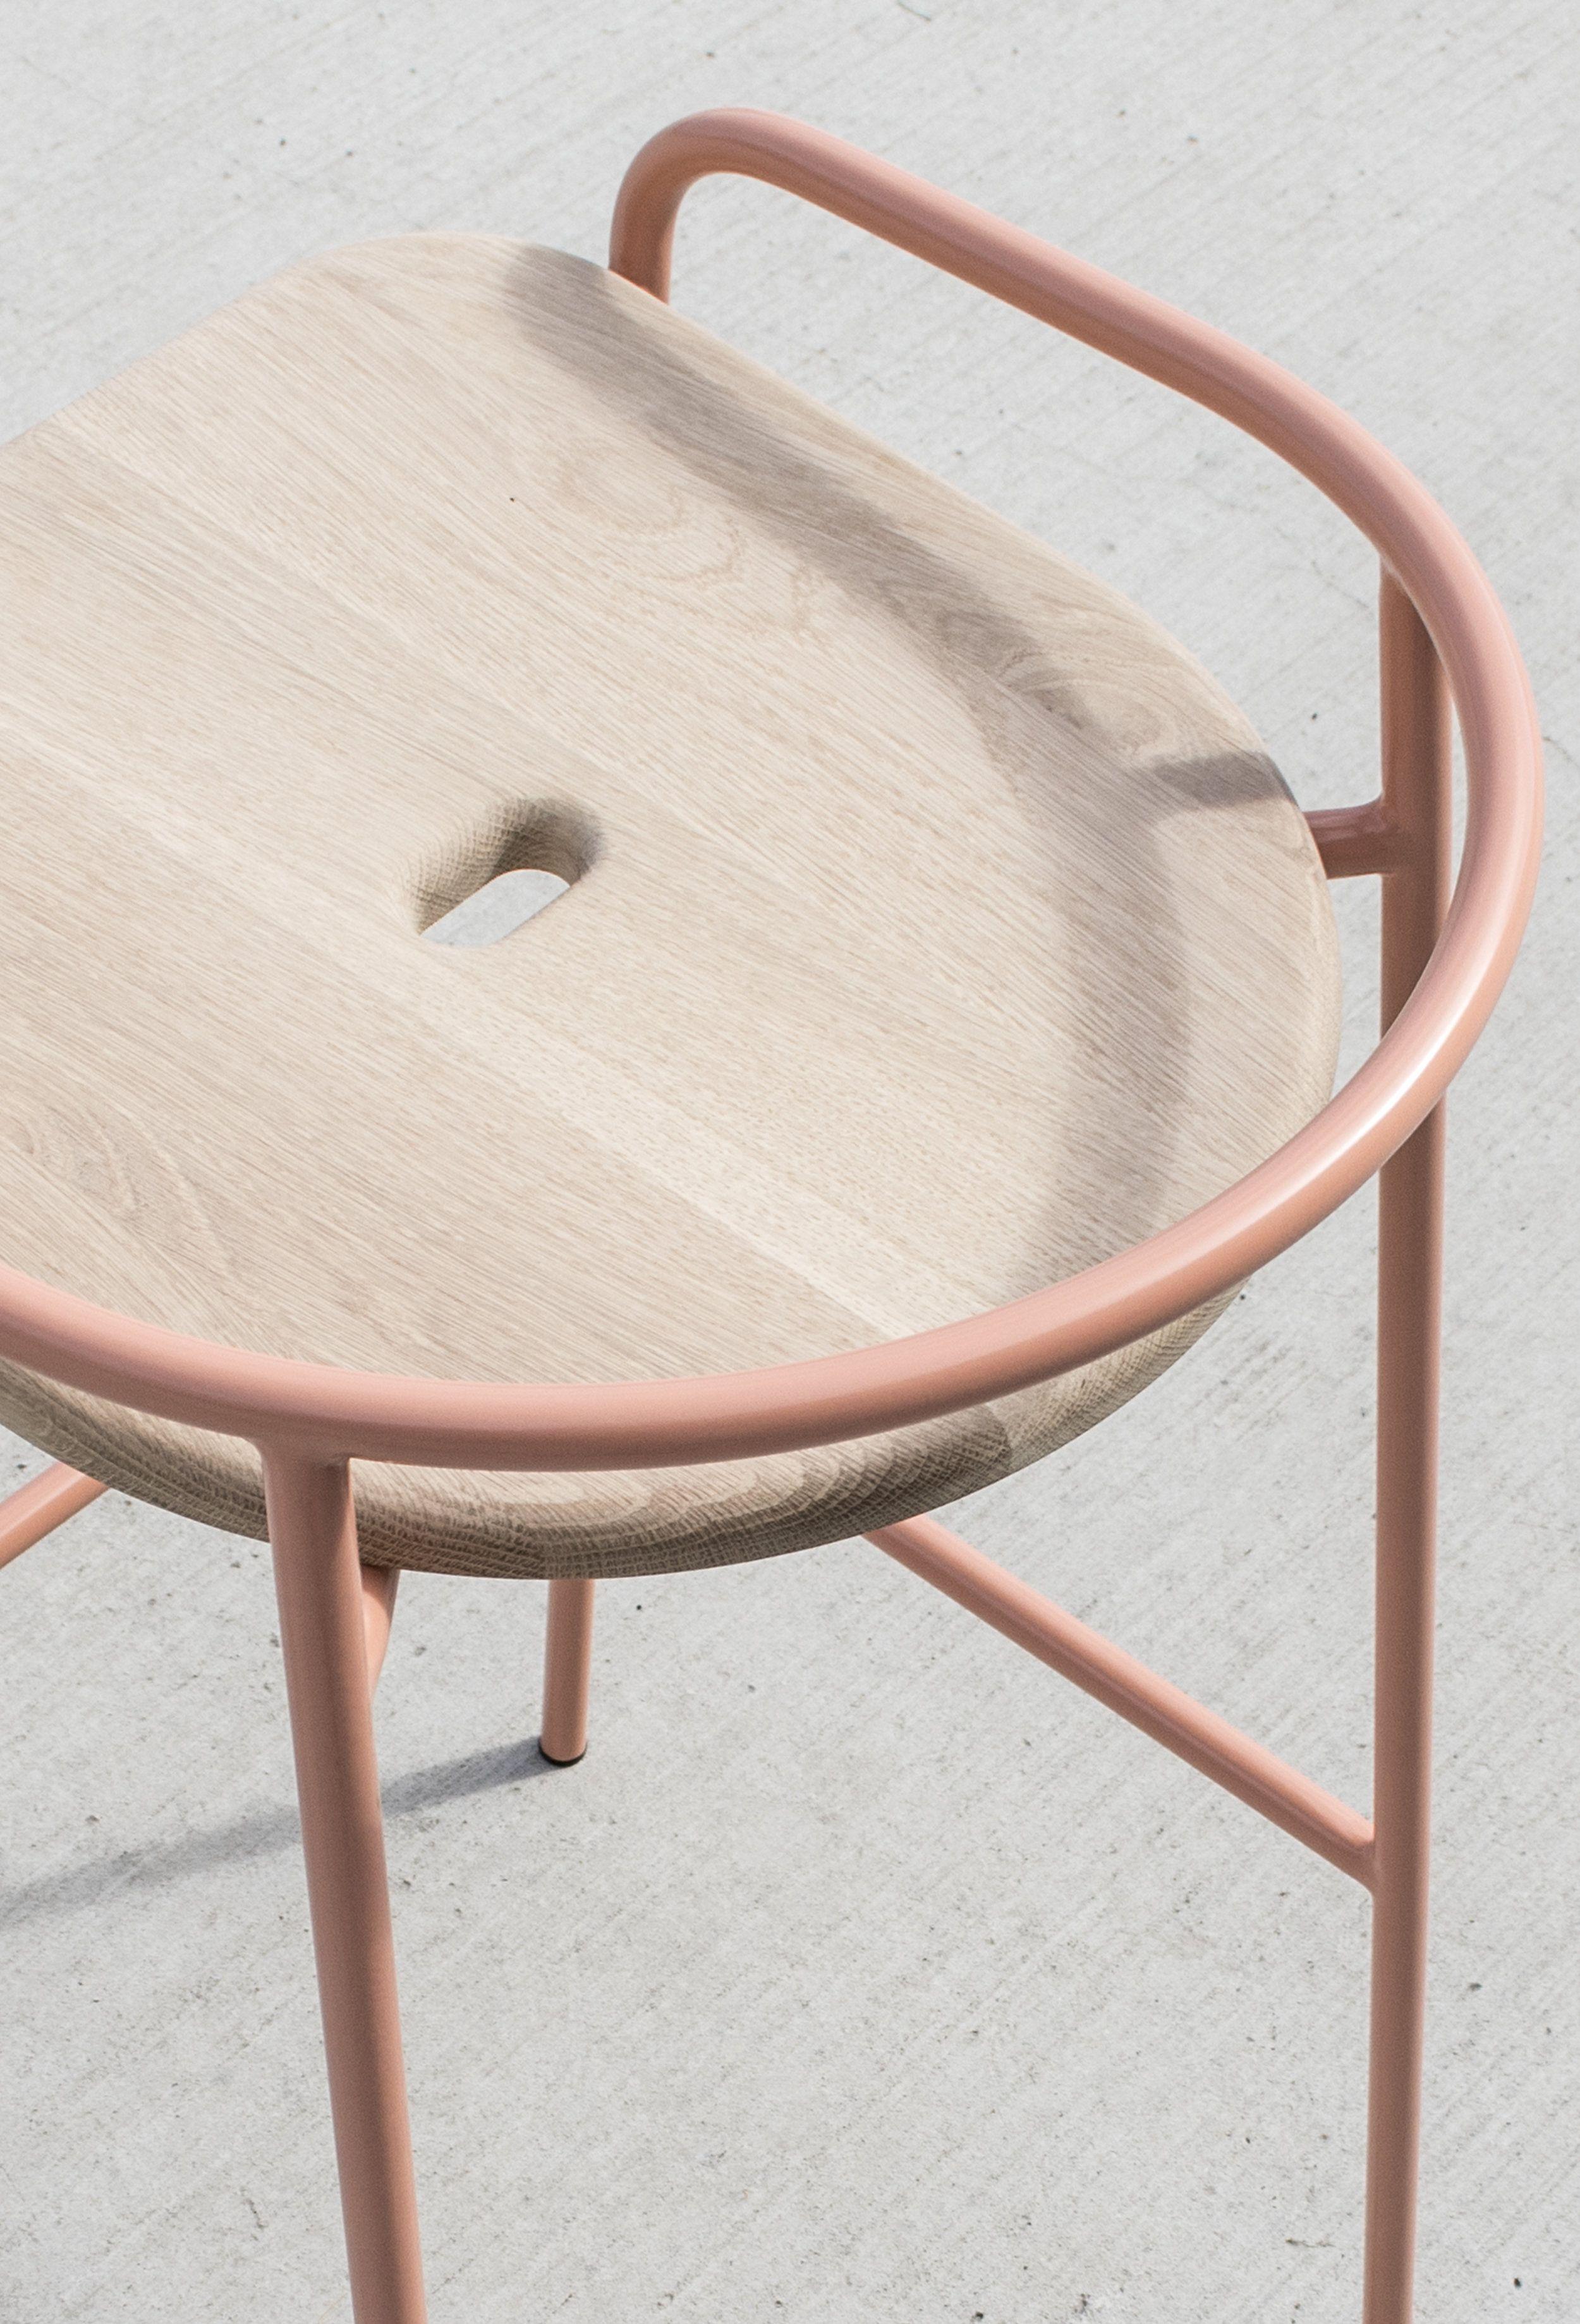 Bender Stool In 2019 Furniture Design Stool Furniture